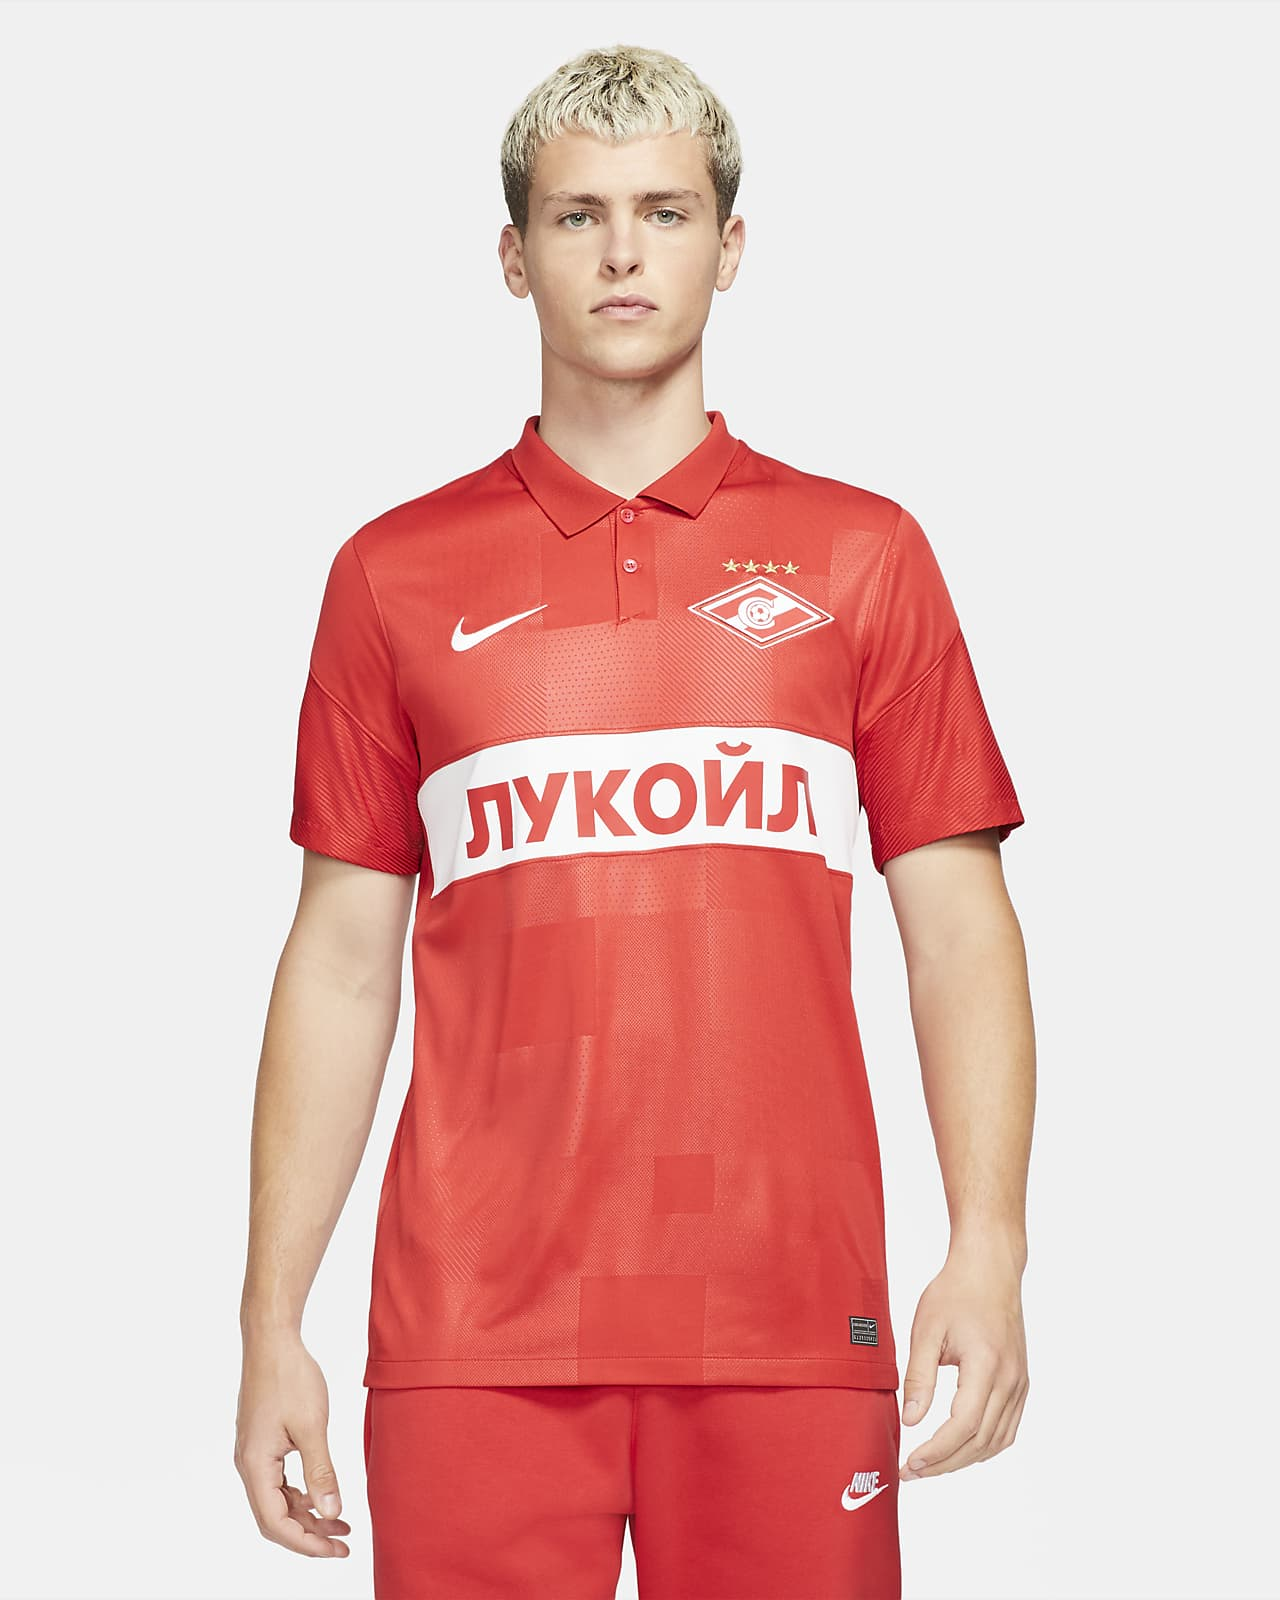 Spartak Moscow 2021/22 Stadyum İç Saha Nike Dri-FIT Erkek Futbol Forması